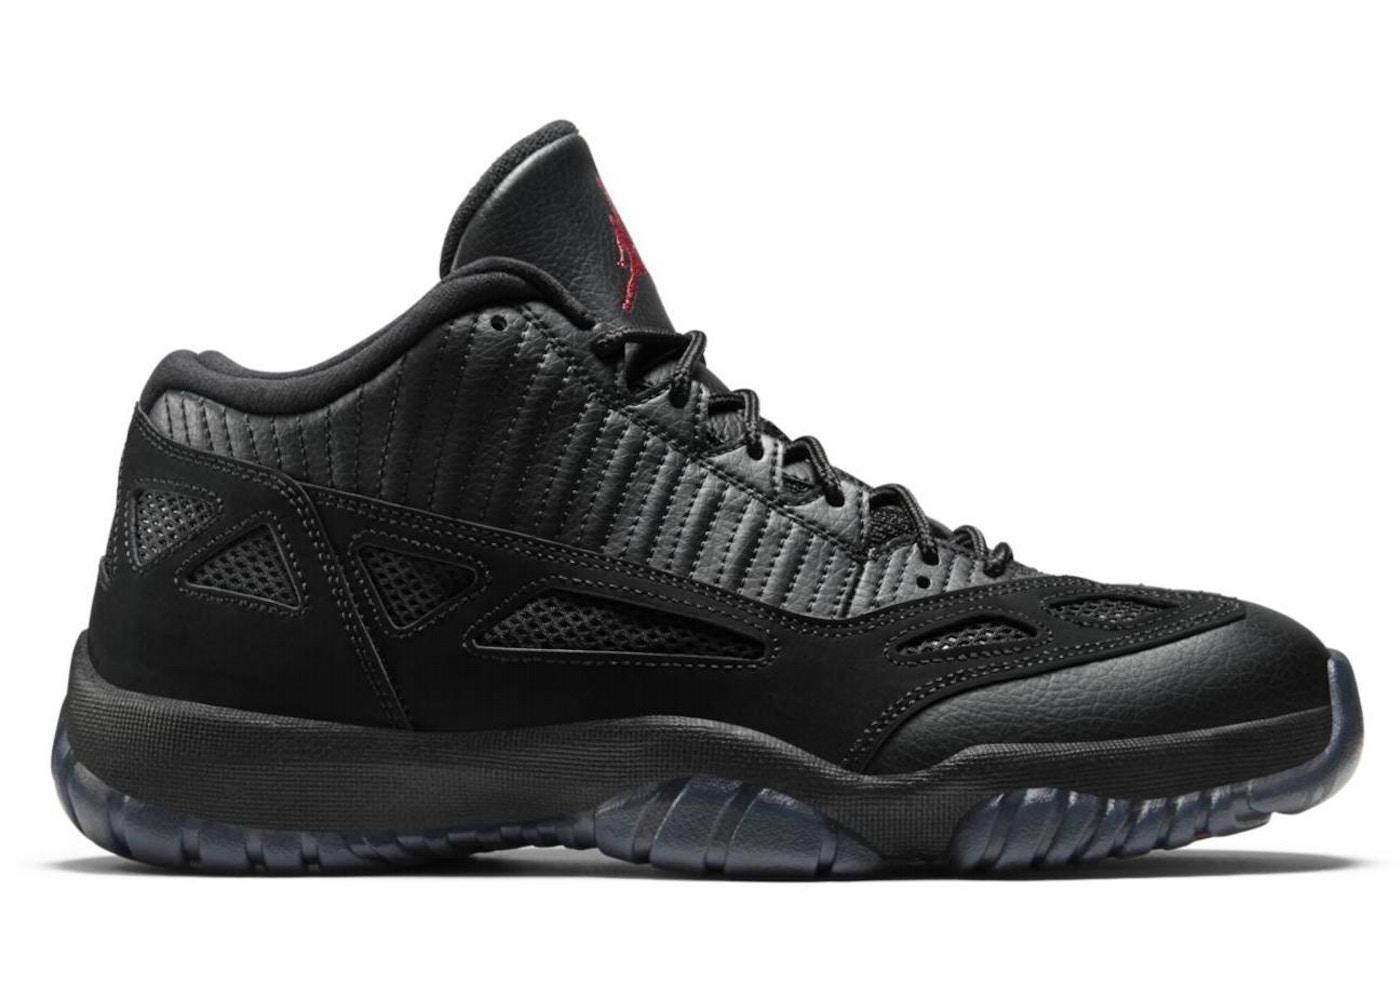 Buy Air Jordan 11 Size 18 Shoes   Deadstock Sneakers 0d5b88a75